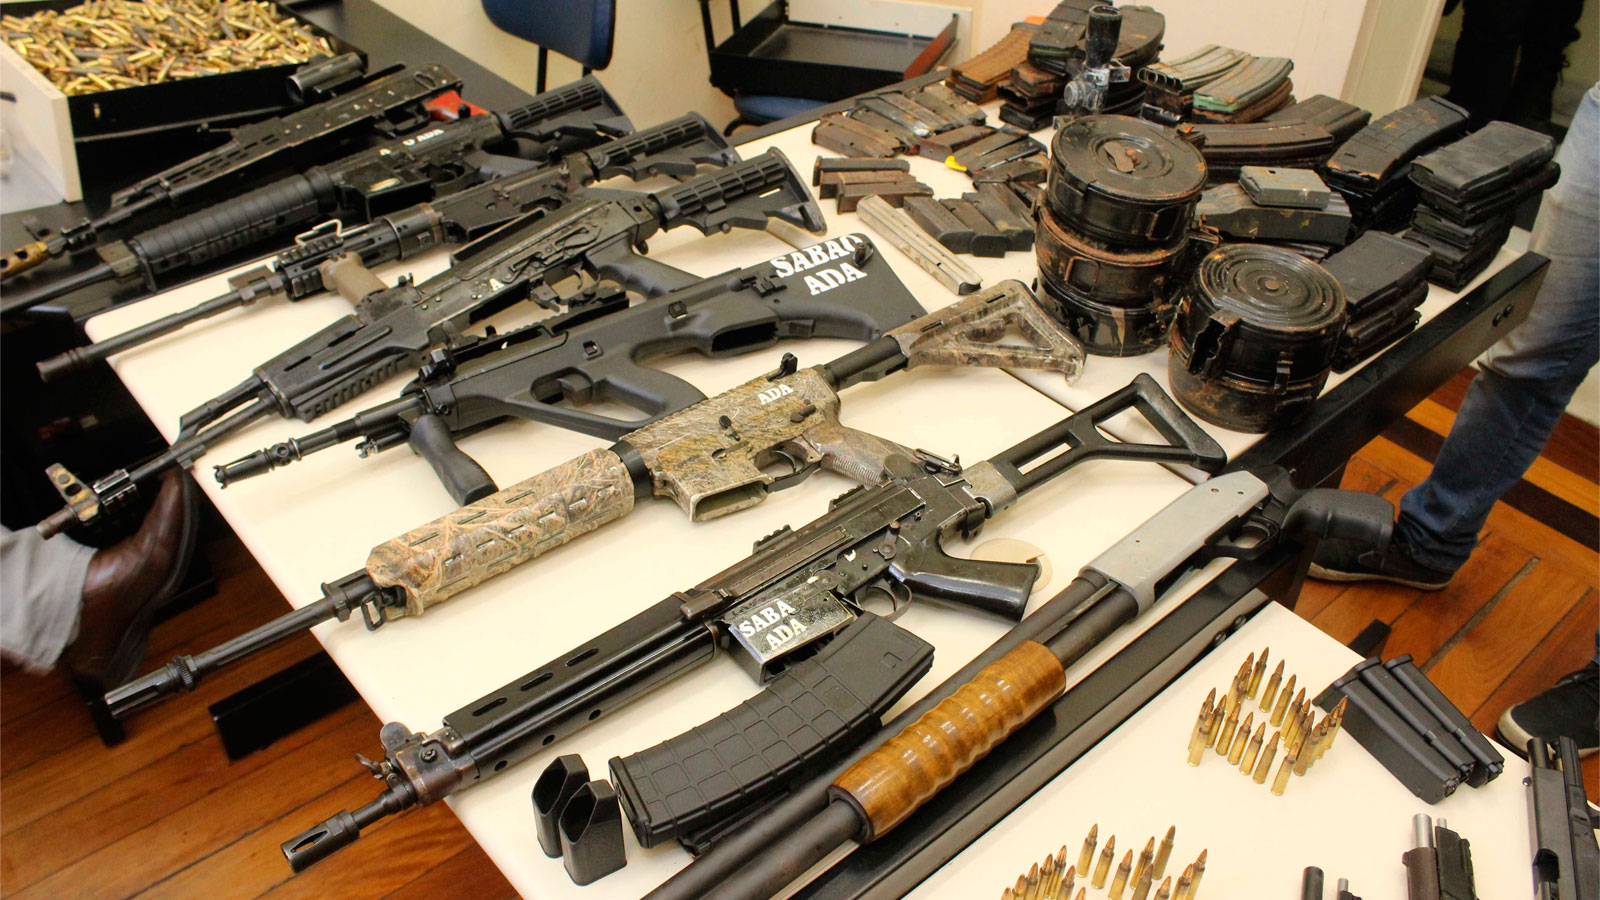 Sancionada lei que torna crime hediondo posse ou porte ilegal de fuzil